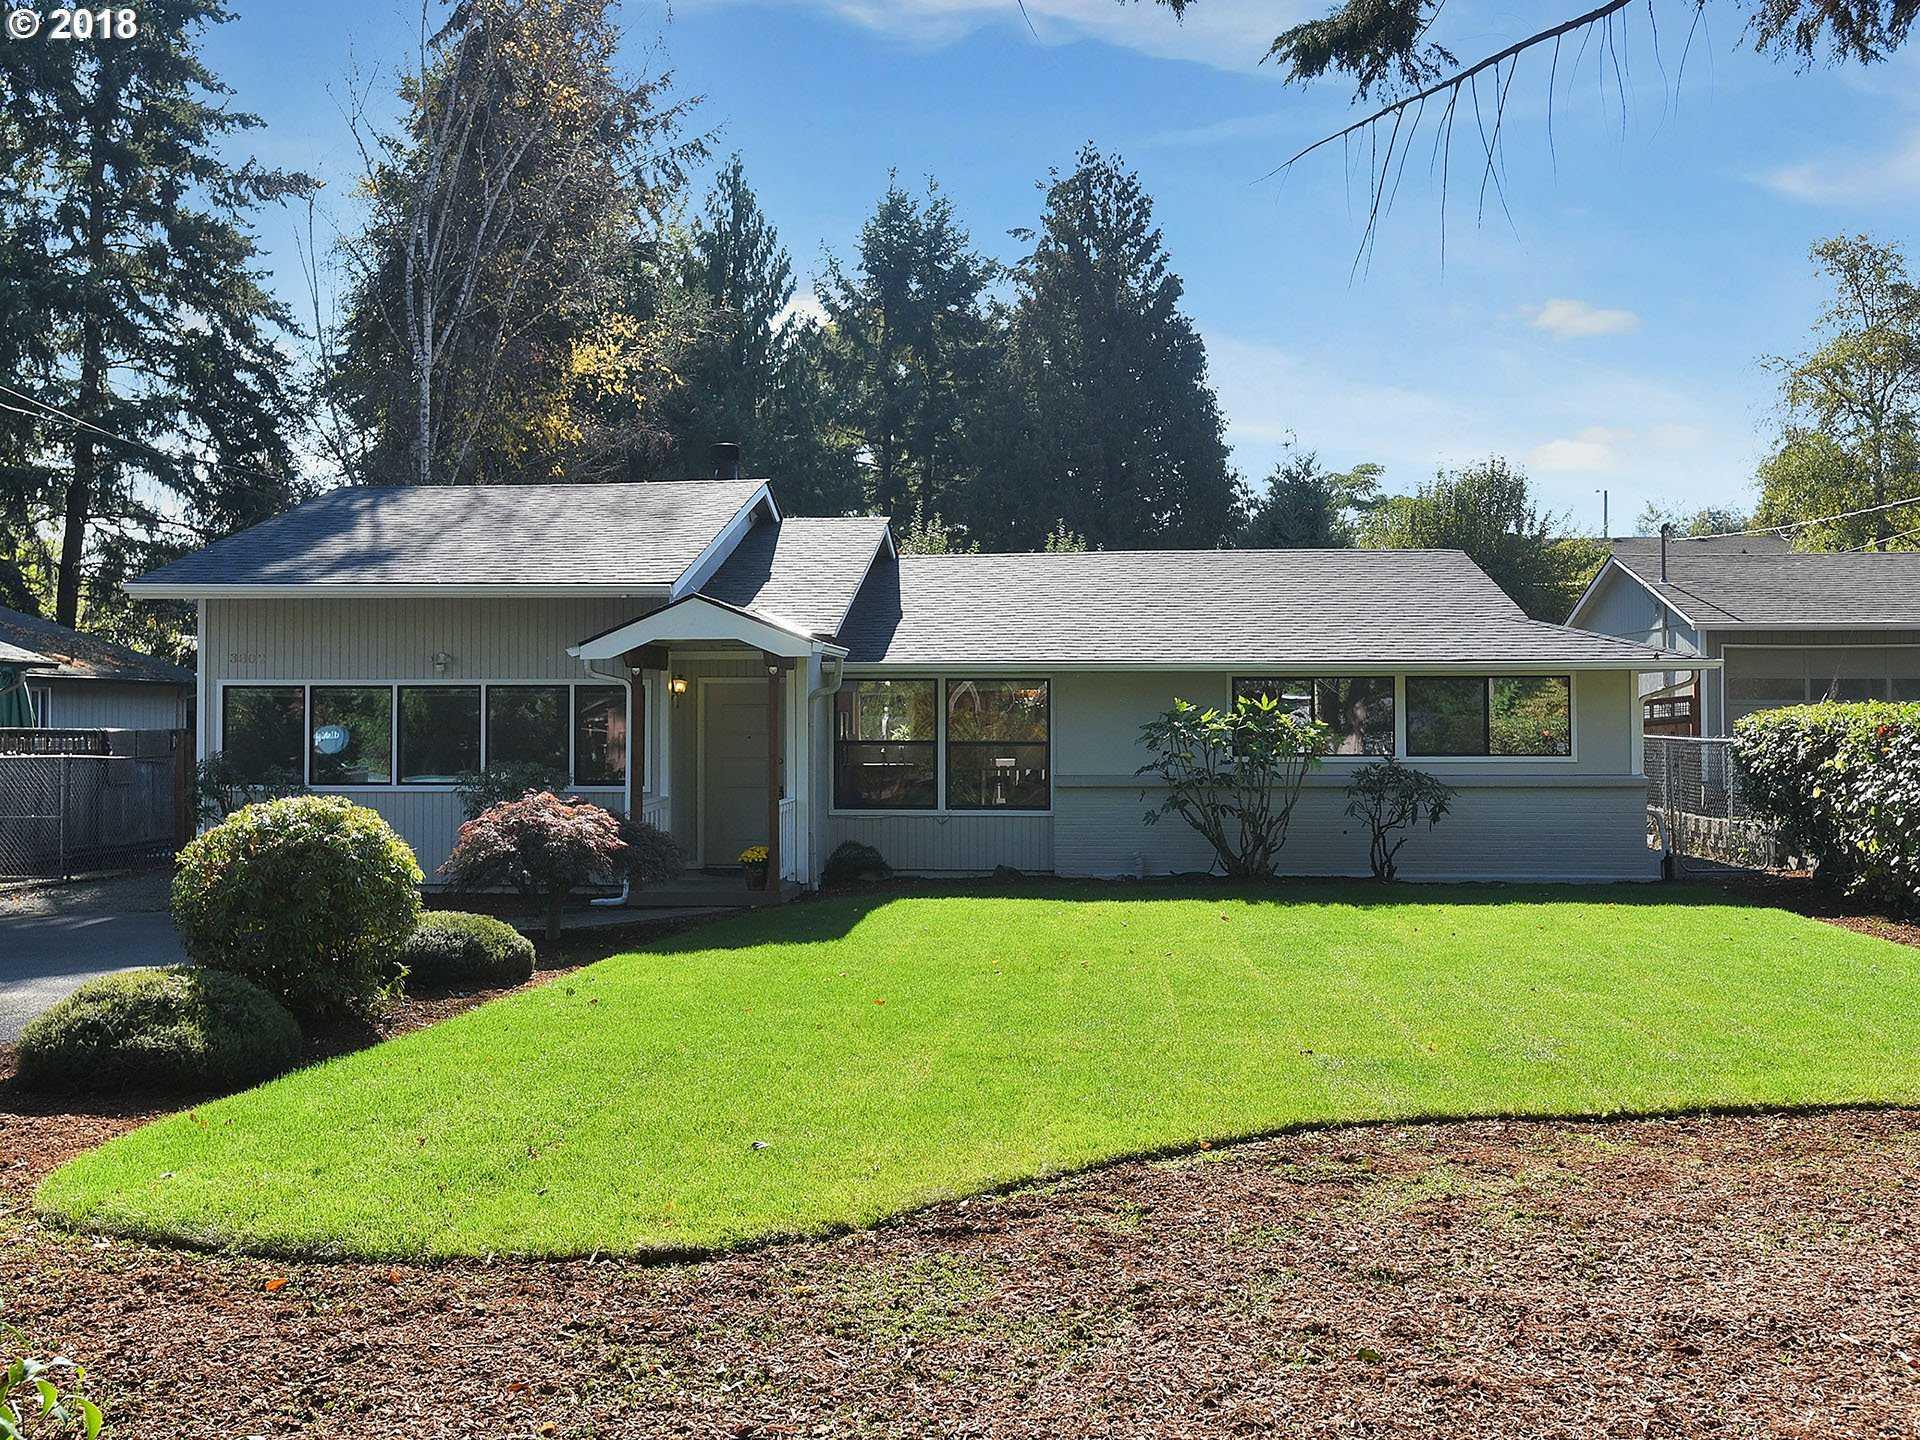 $445,000 - 4Br/2Ba -  for Sale in West Portland Park, Portland